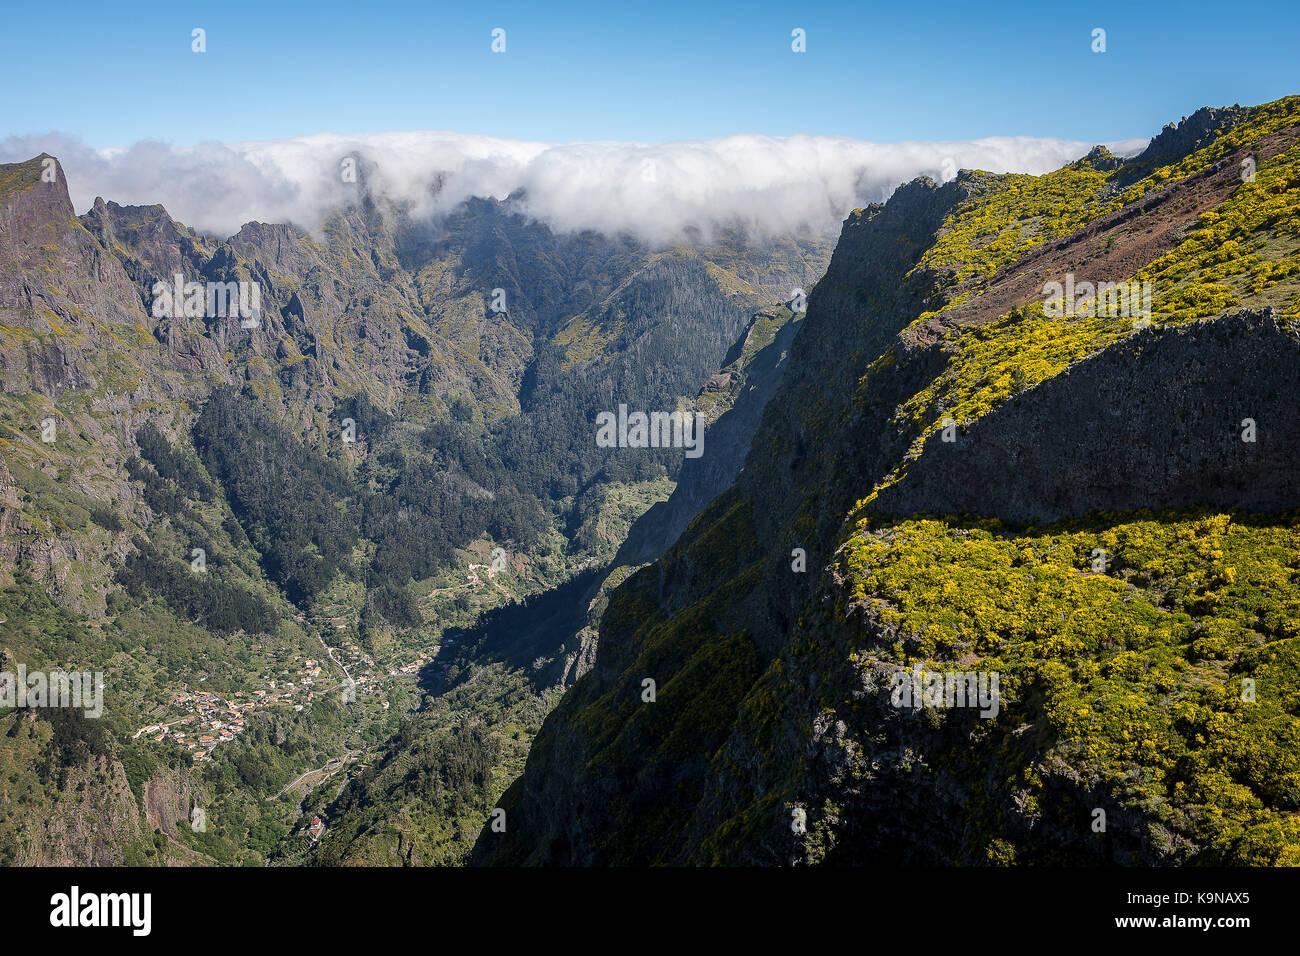 Landscape and Curral das Freiras, Madeira, Portugal - Stock Image